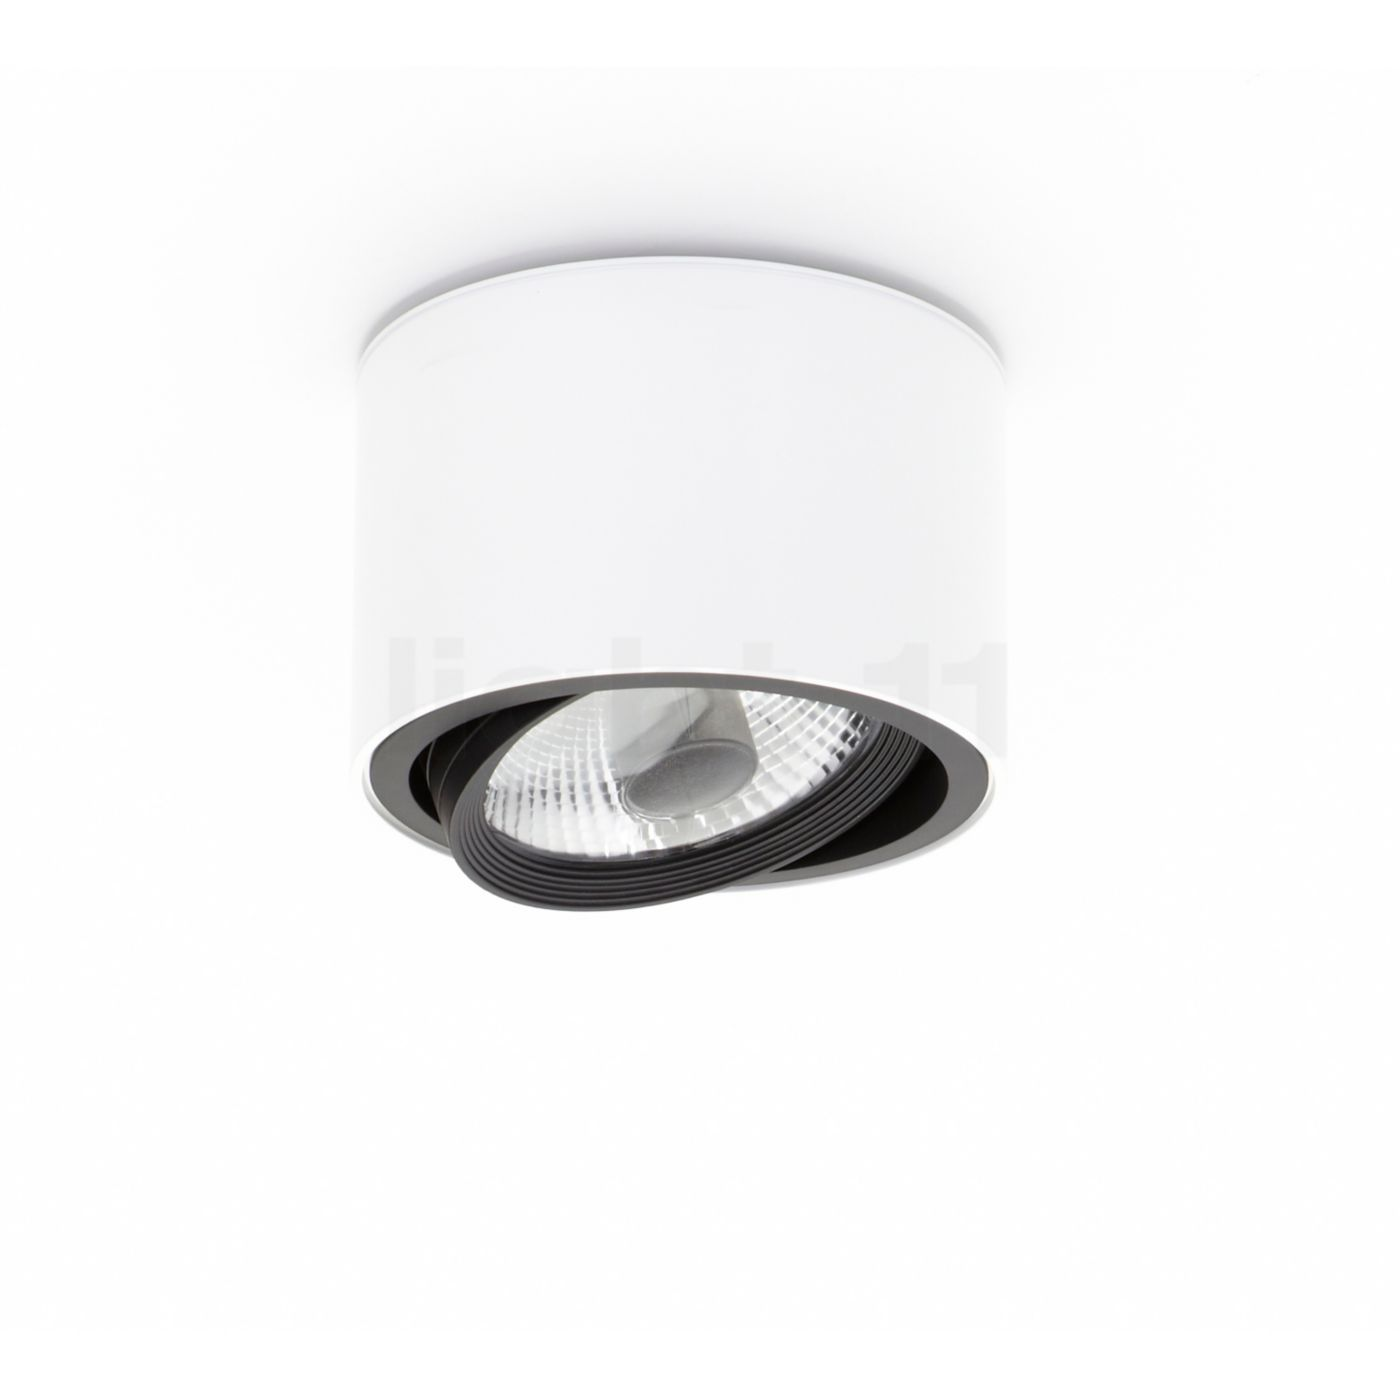 Mawa Design 111er Round Ceiling Light Hv Round Ceiling Light Boutique Interior Design Ceiling Lights